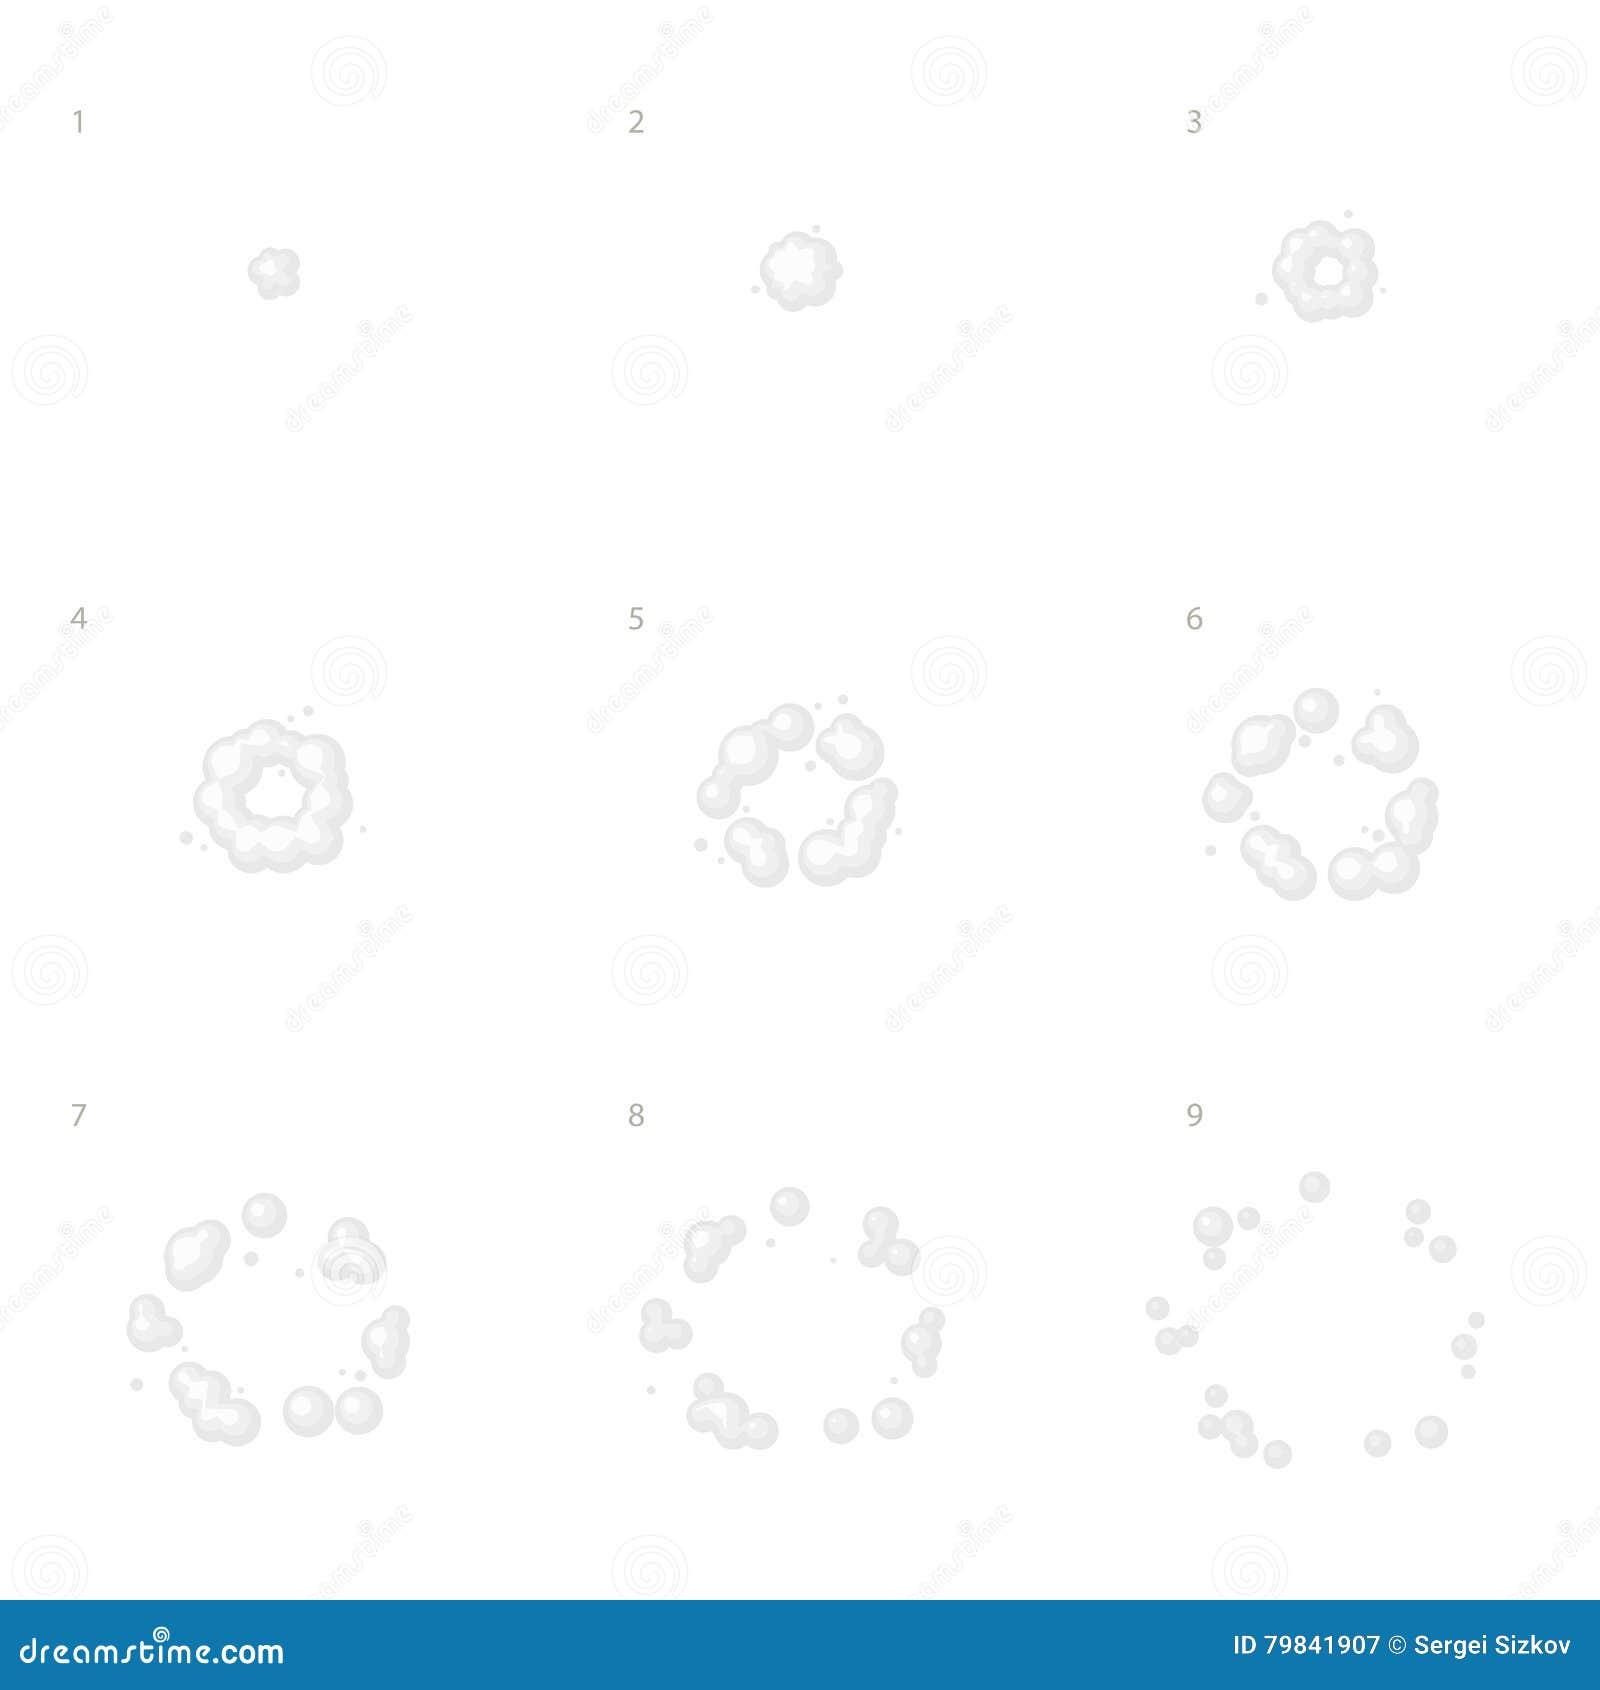 Explode Animation Sequence . Cartoon Explosion Frames. Vector Stock ...